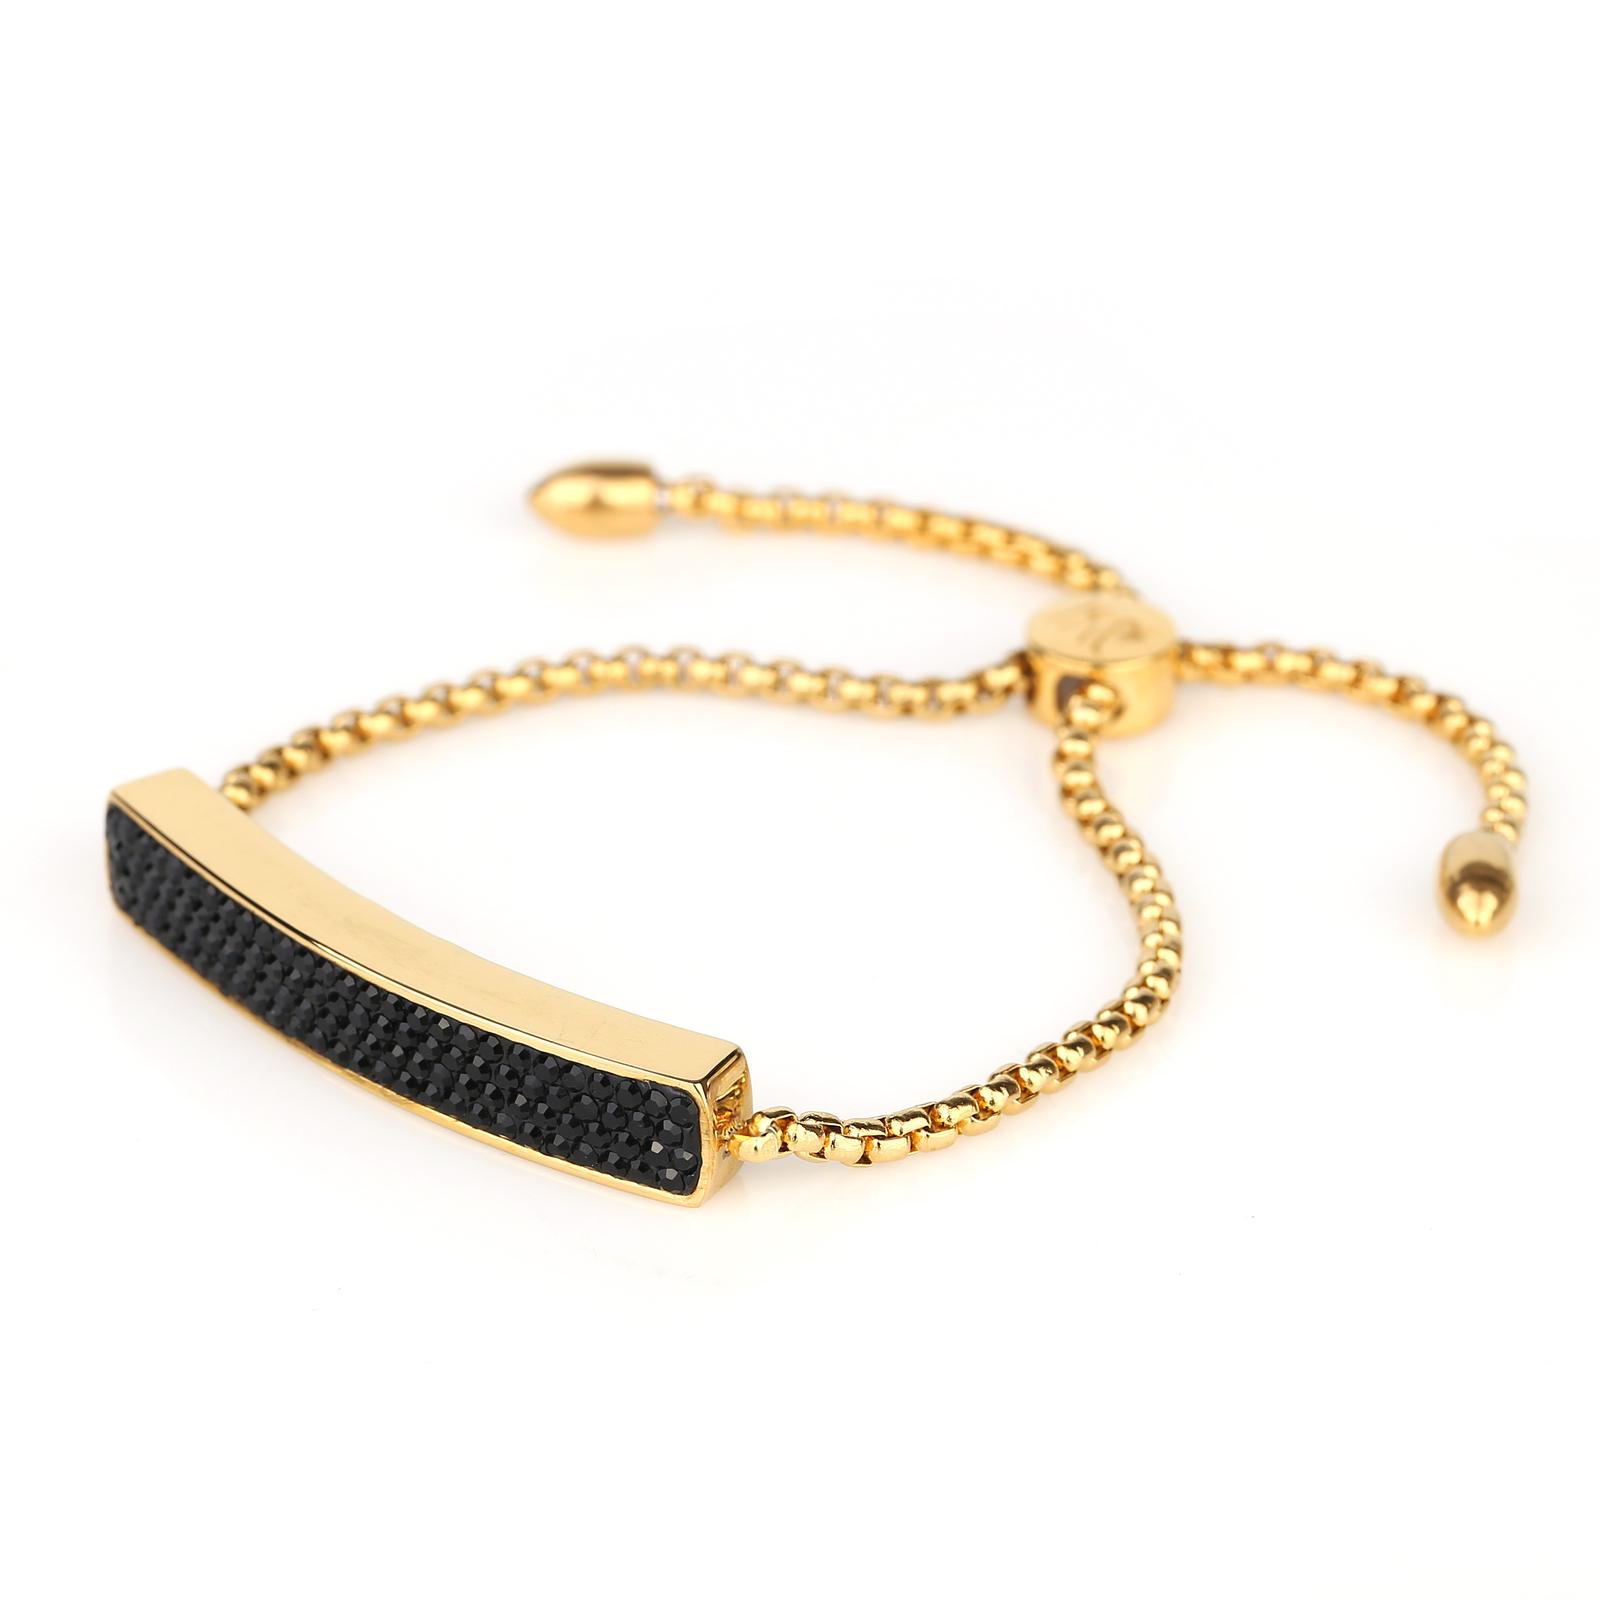 UNITED ELEGANCE Gold Tone Bolo Bar Bracelet With Black Swarovski Style Crystals